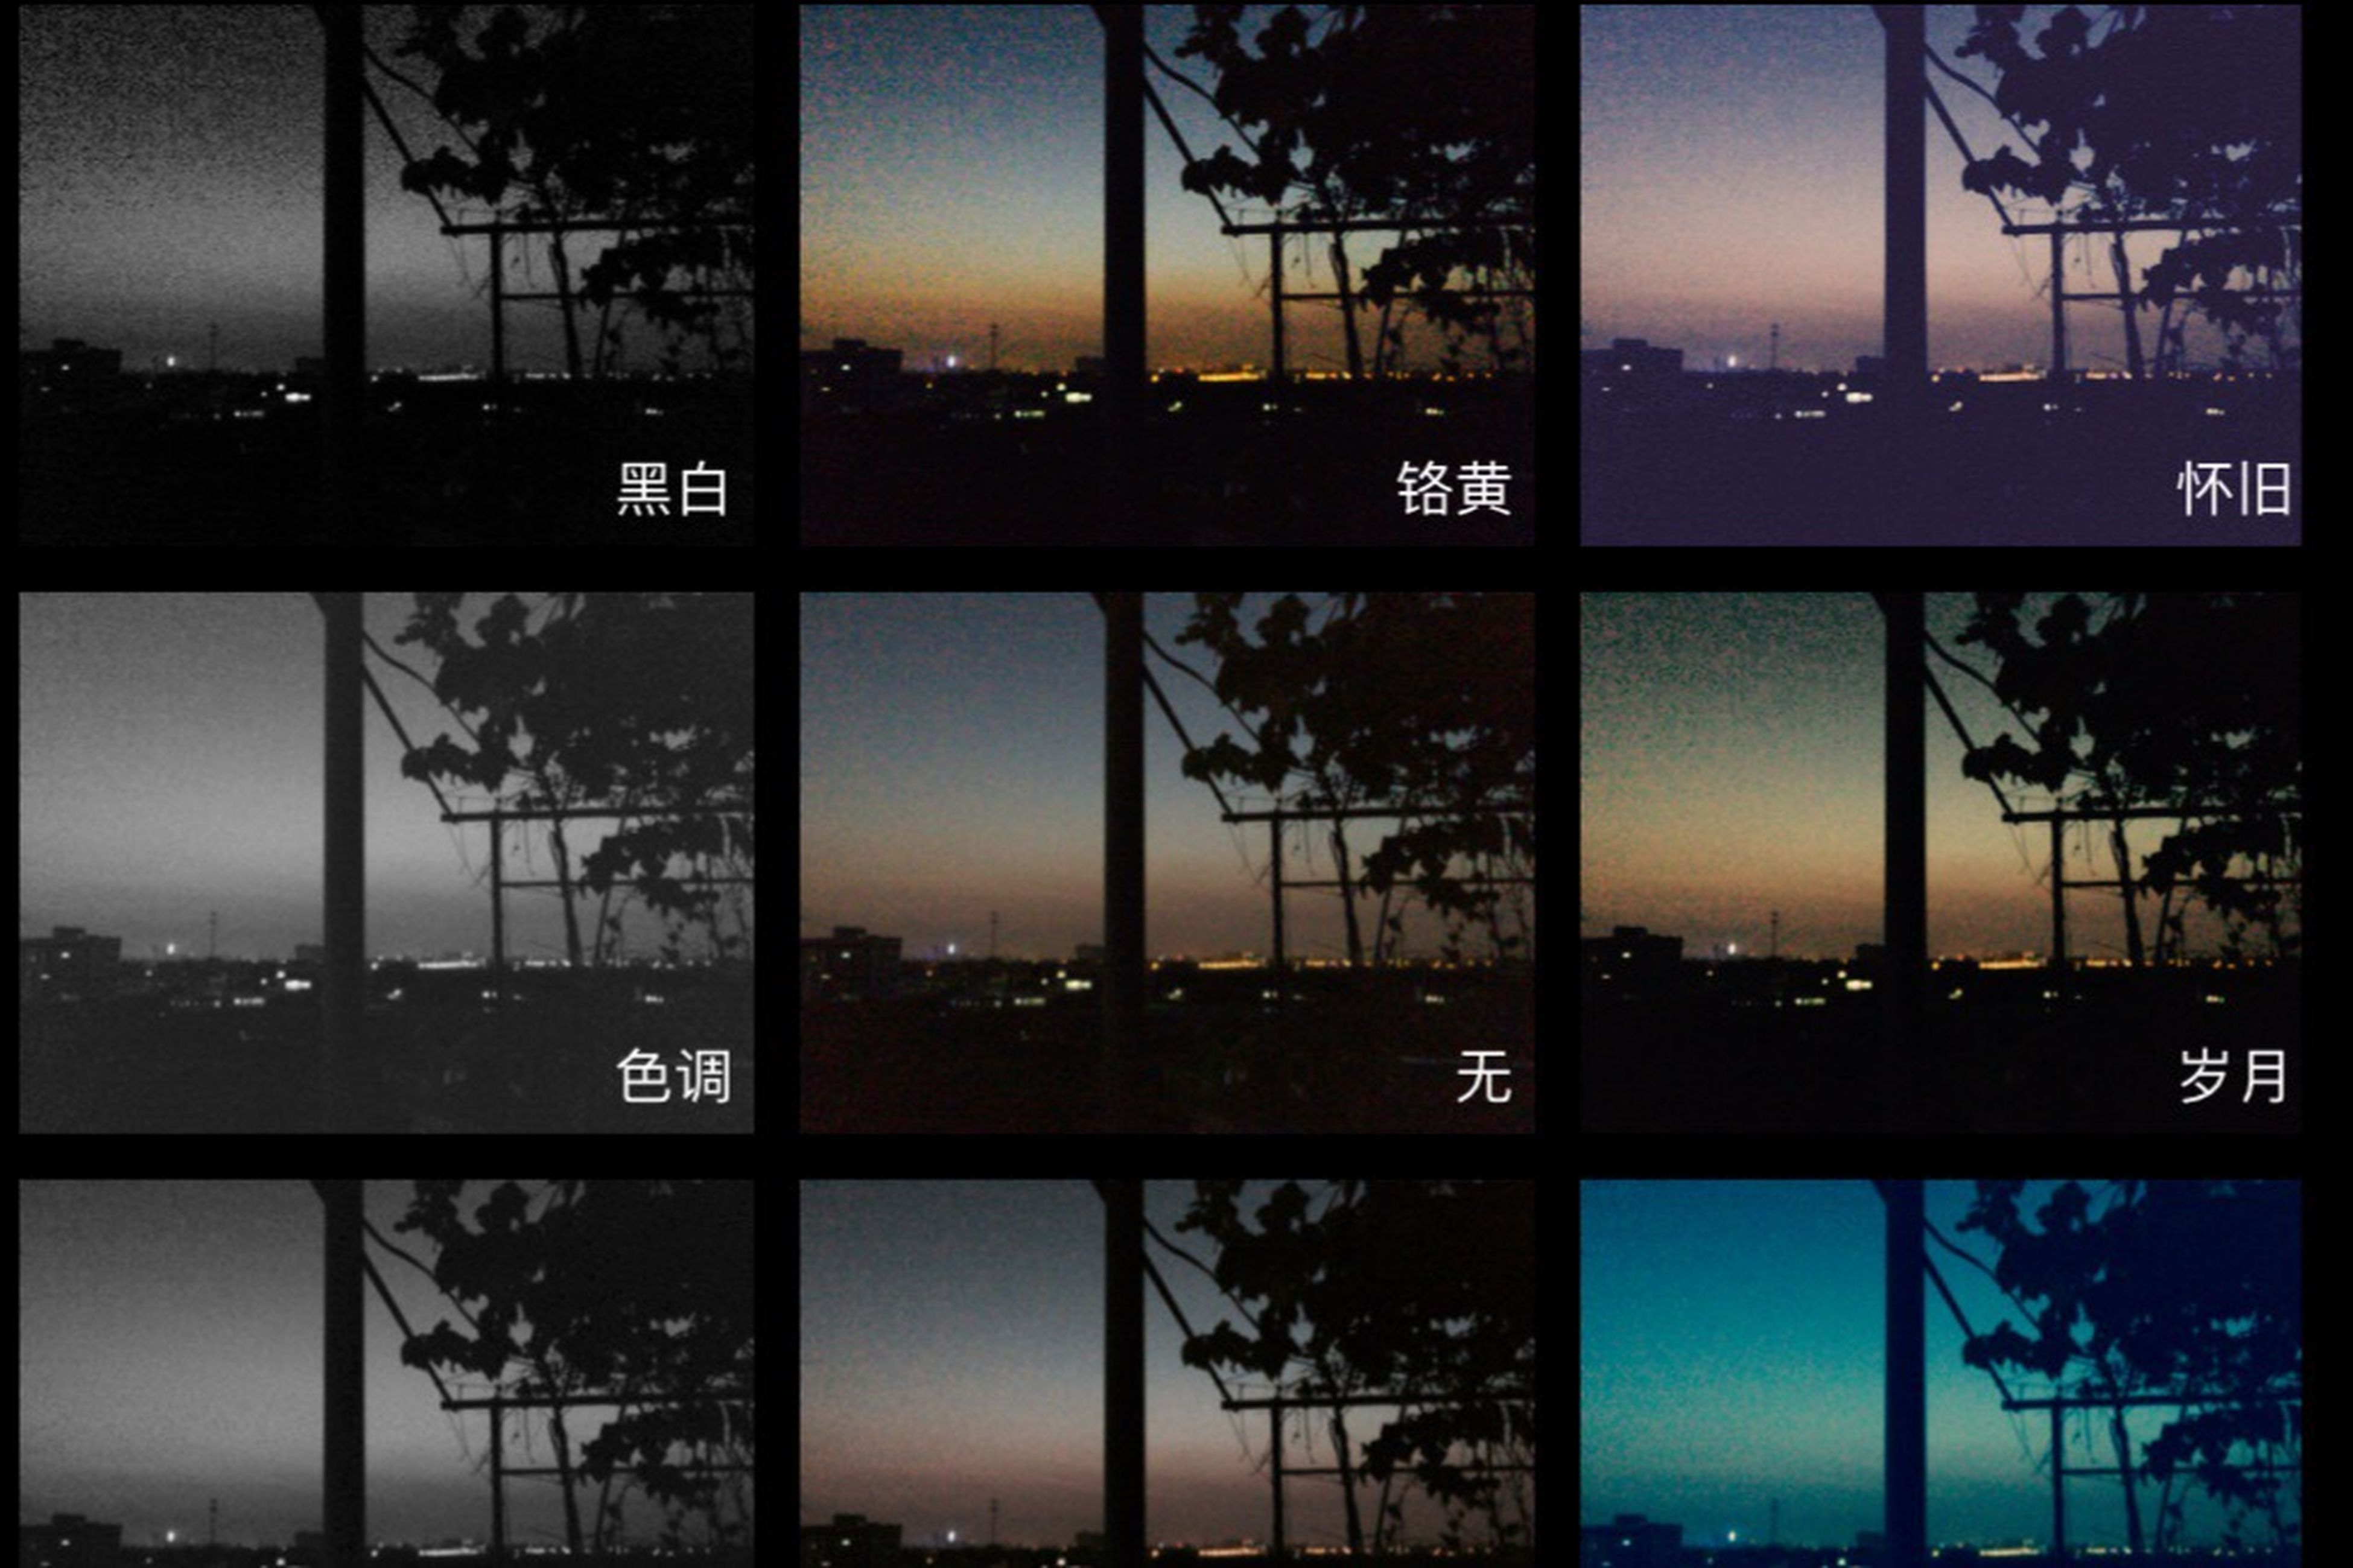 illuminated, city, night, blue, cityscape, sky, no people, city life, dark, modern, green color, vignette